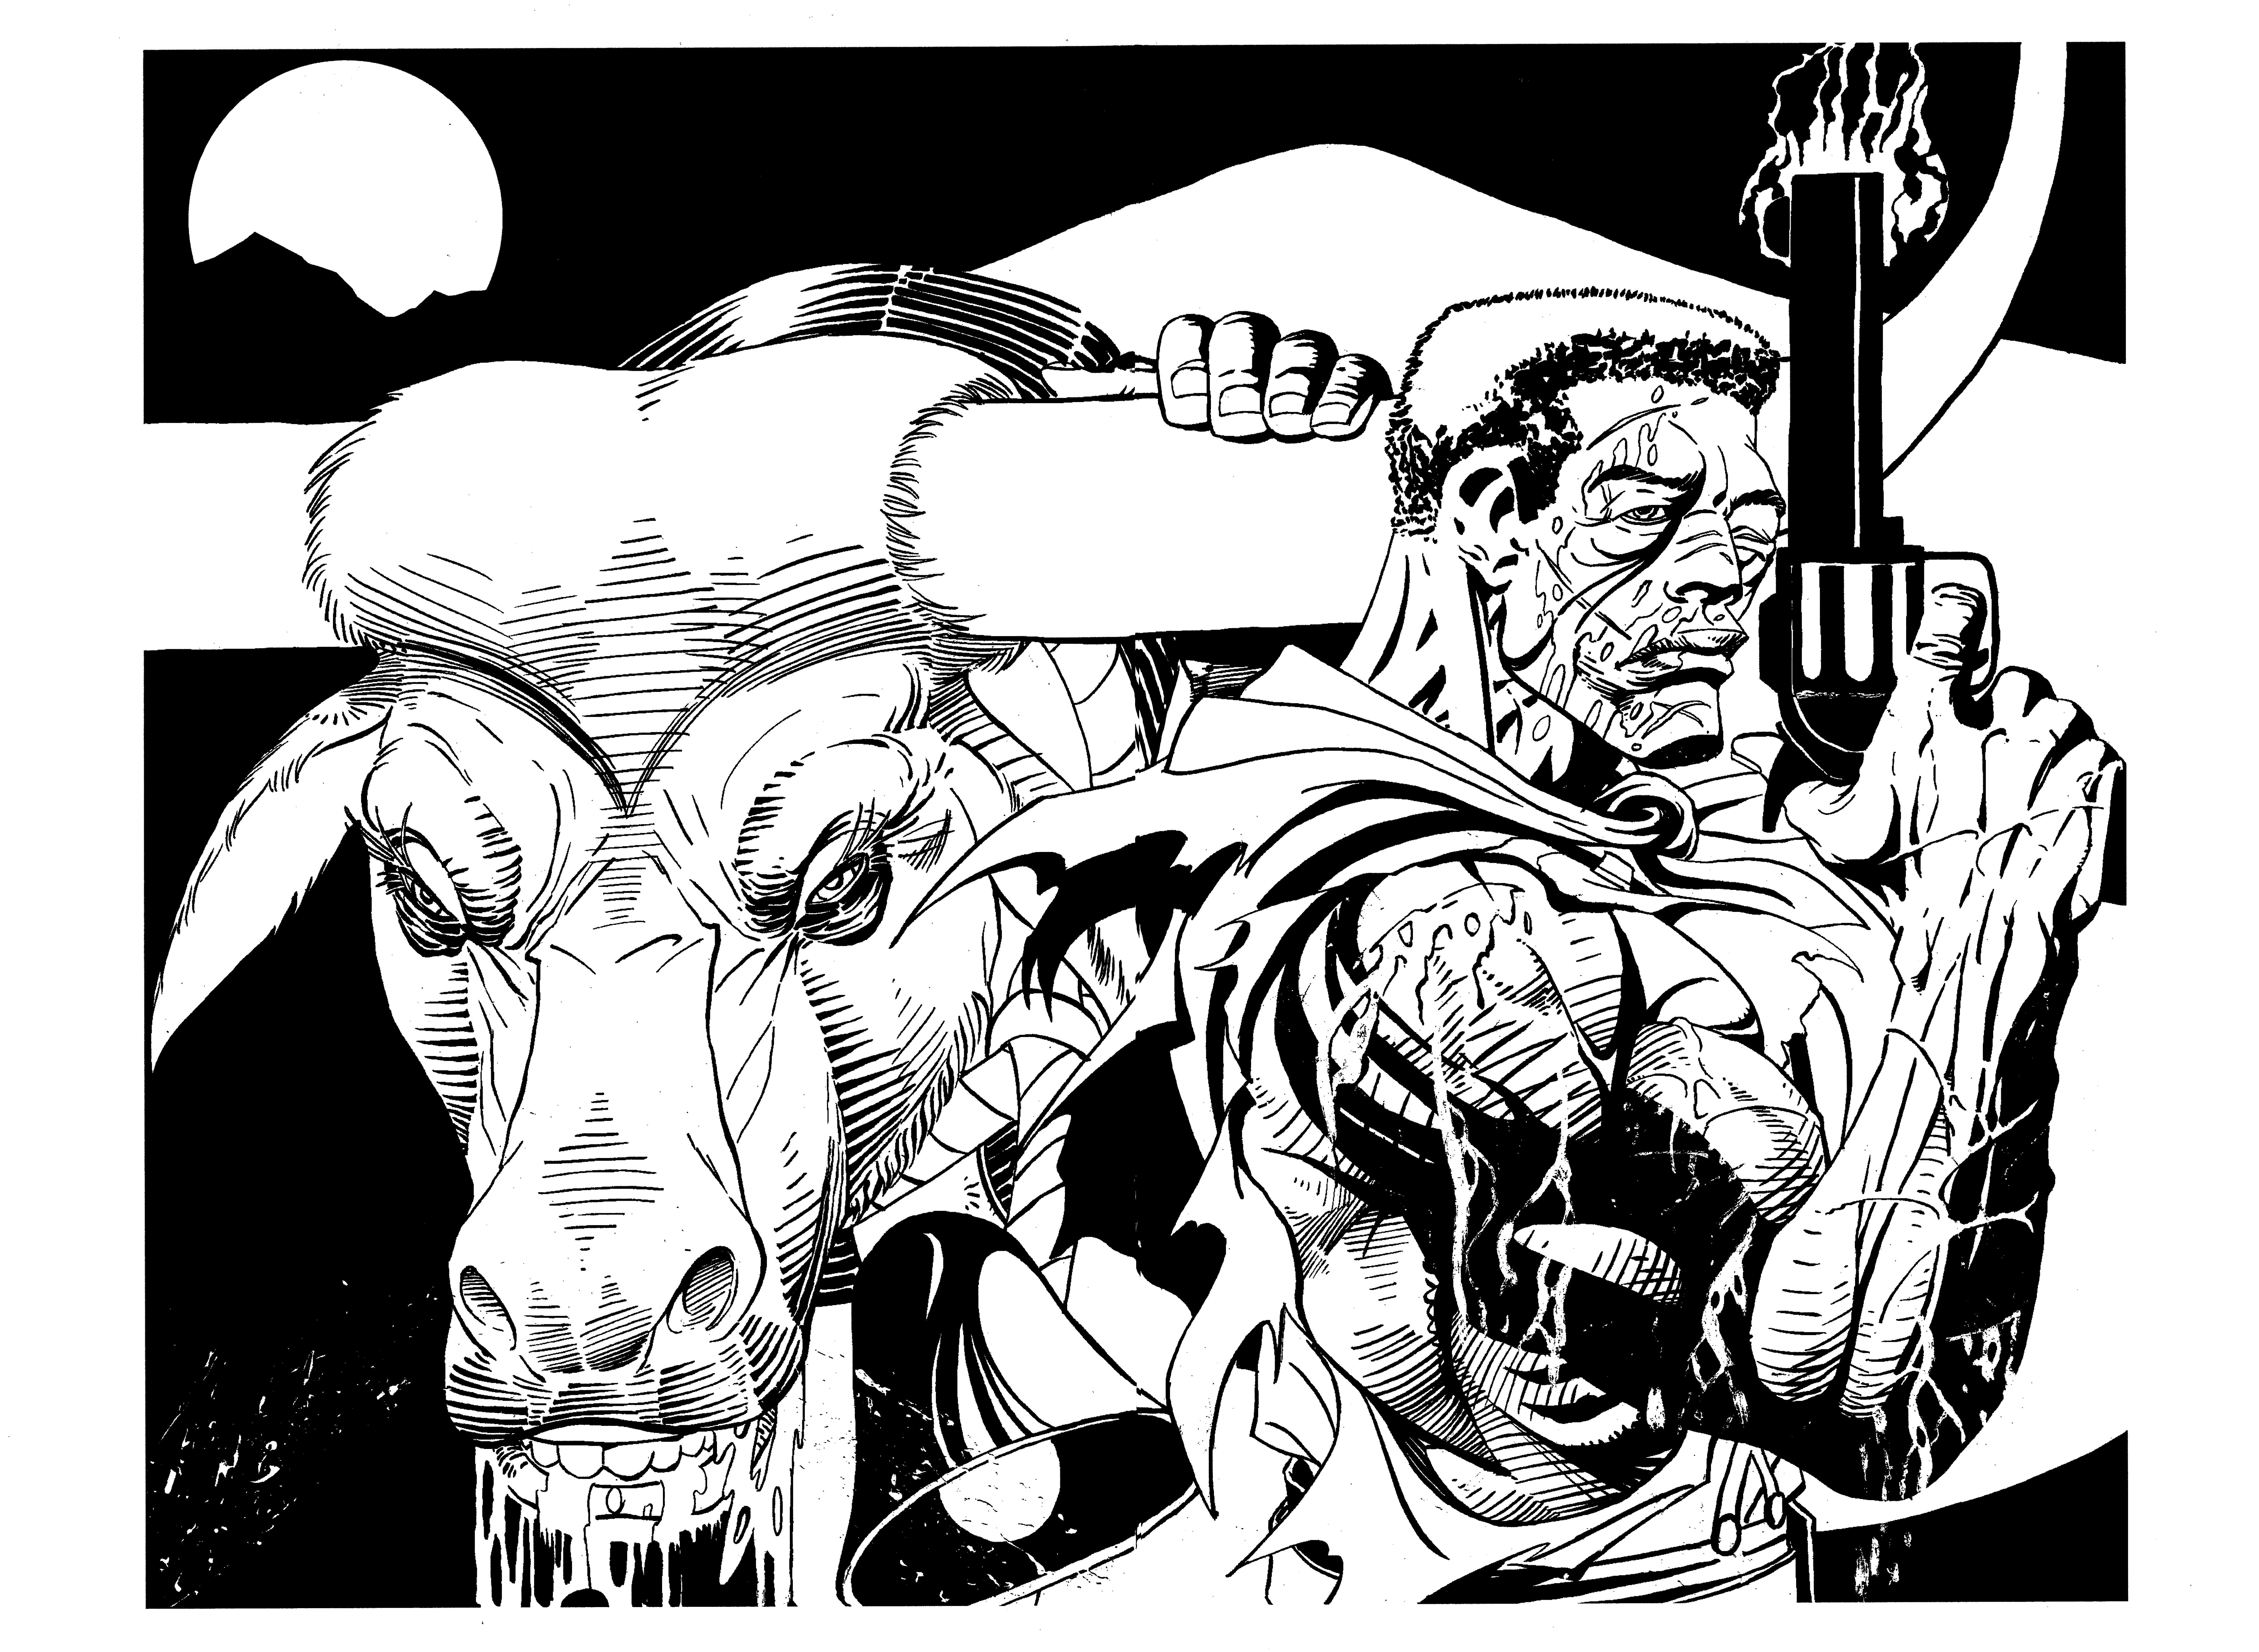 8400x6143 Thank You, Frank Miller! Pivotal Comics